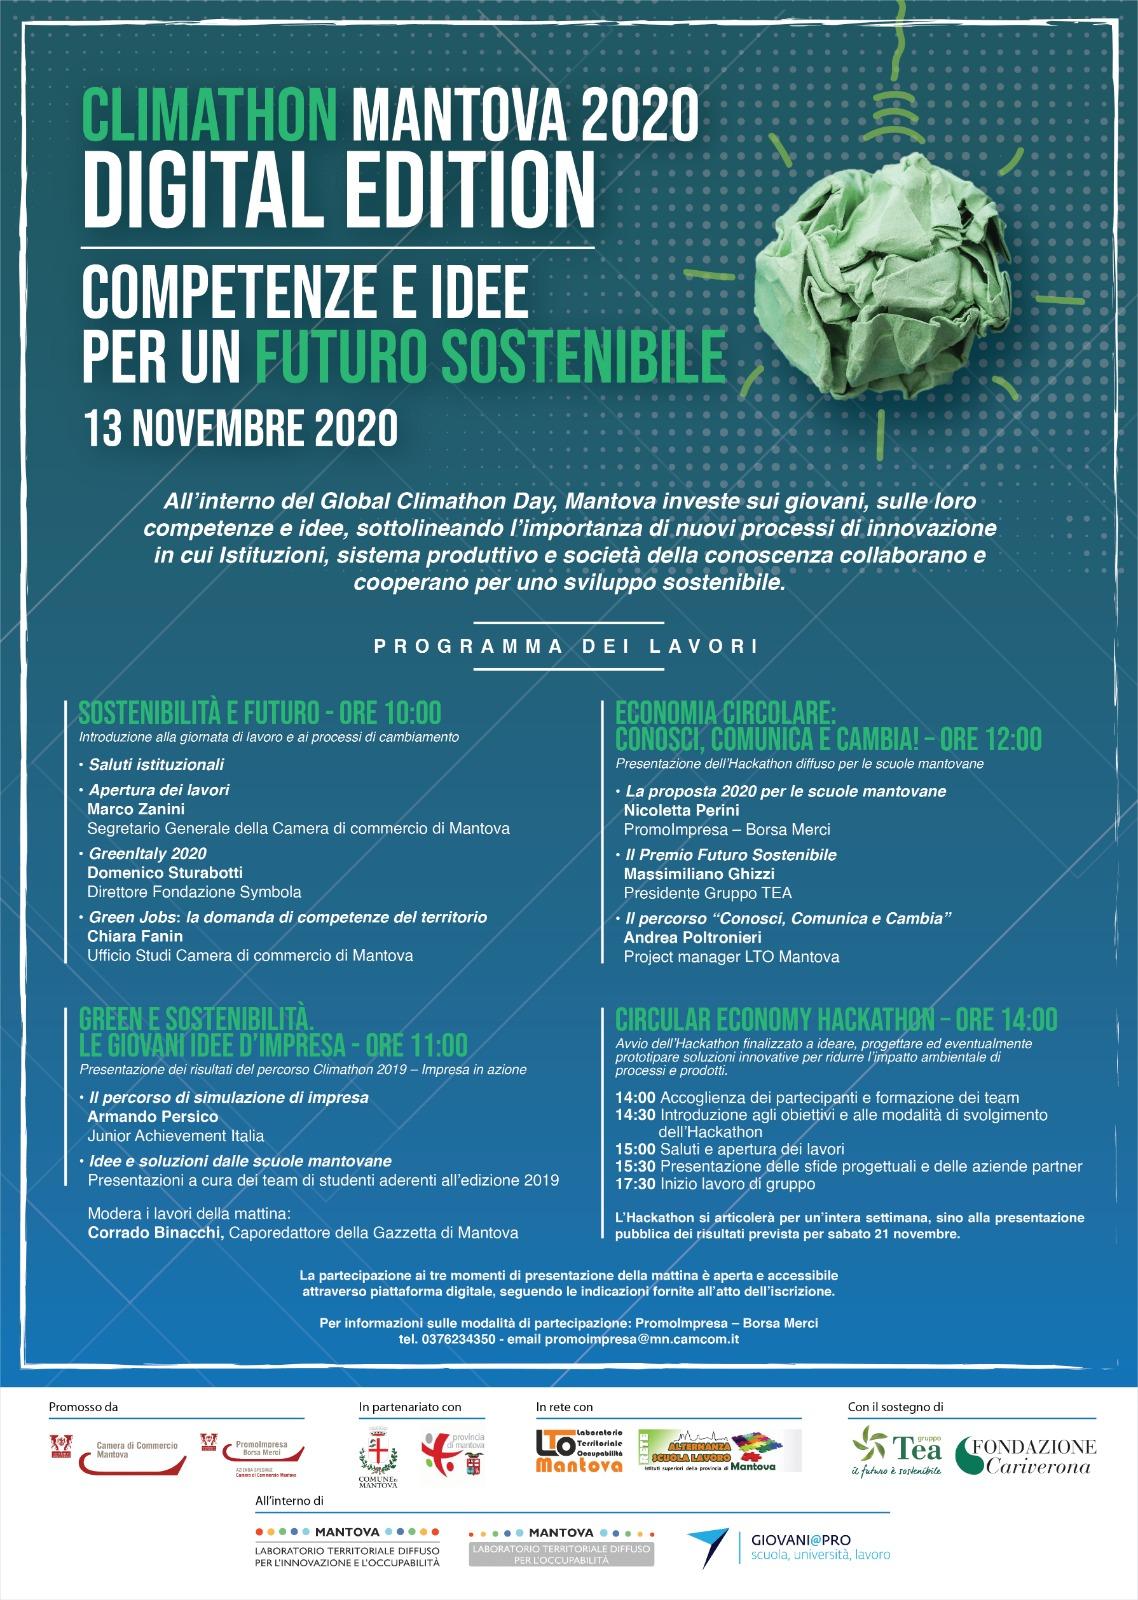 Climathon 2020 Mantova